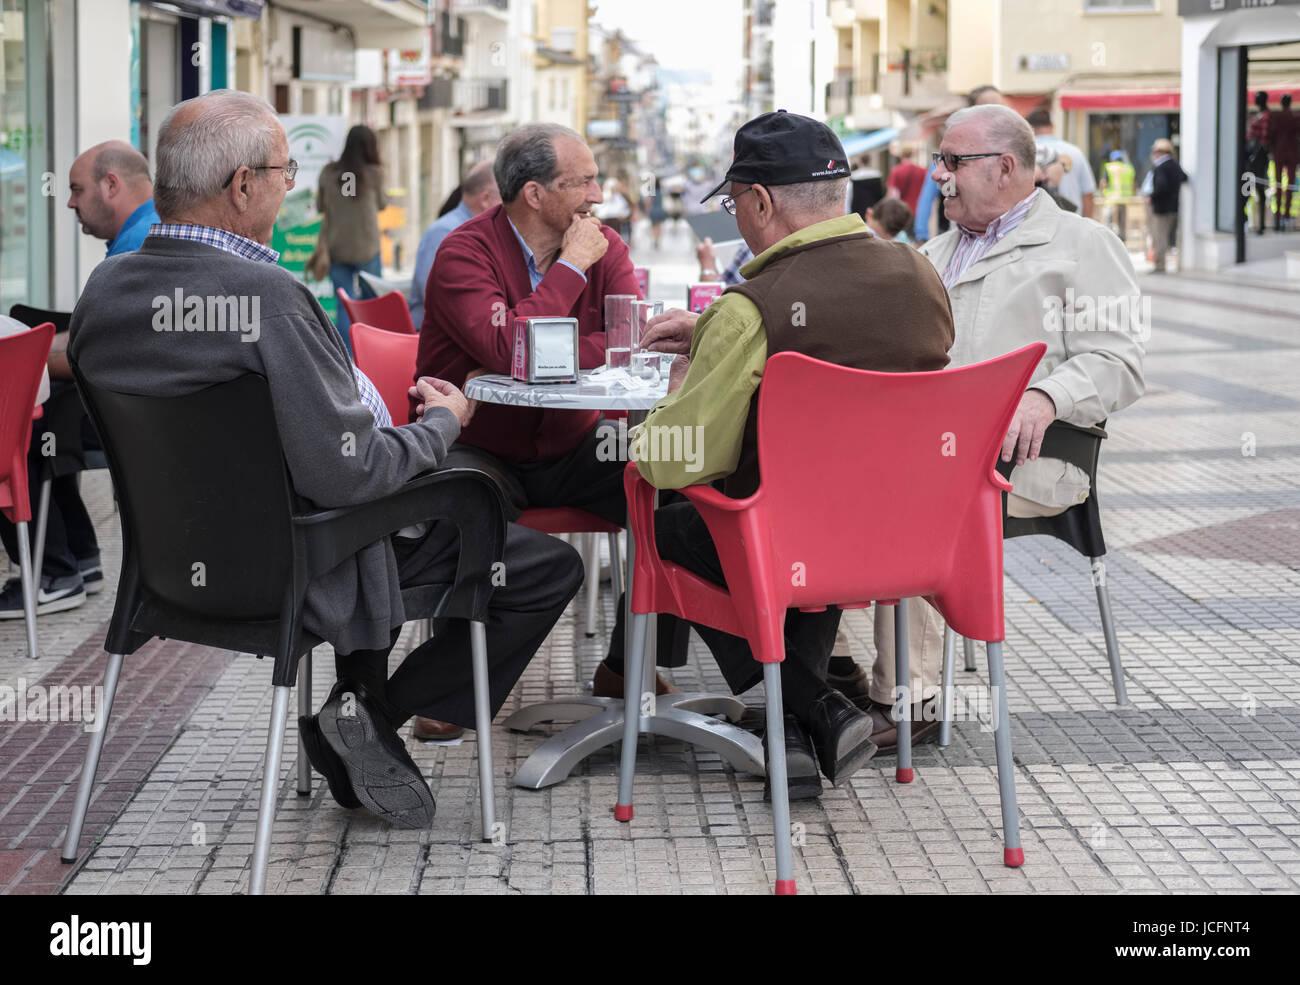 Four older men having morning drinks, Ronda, Málaga, Spain - Stock Image